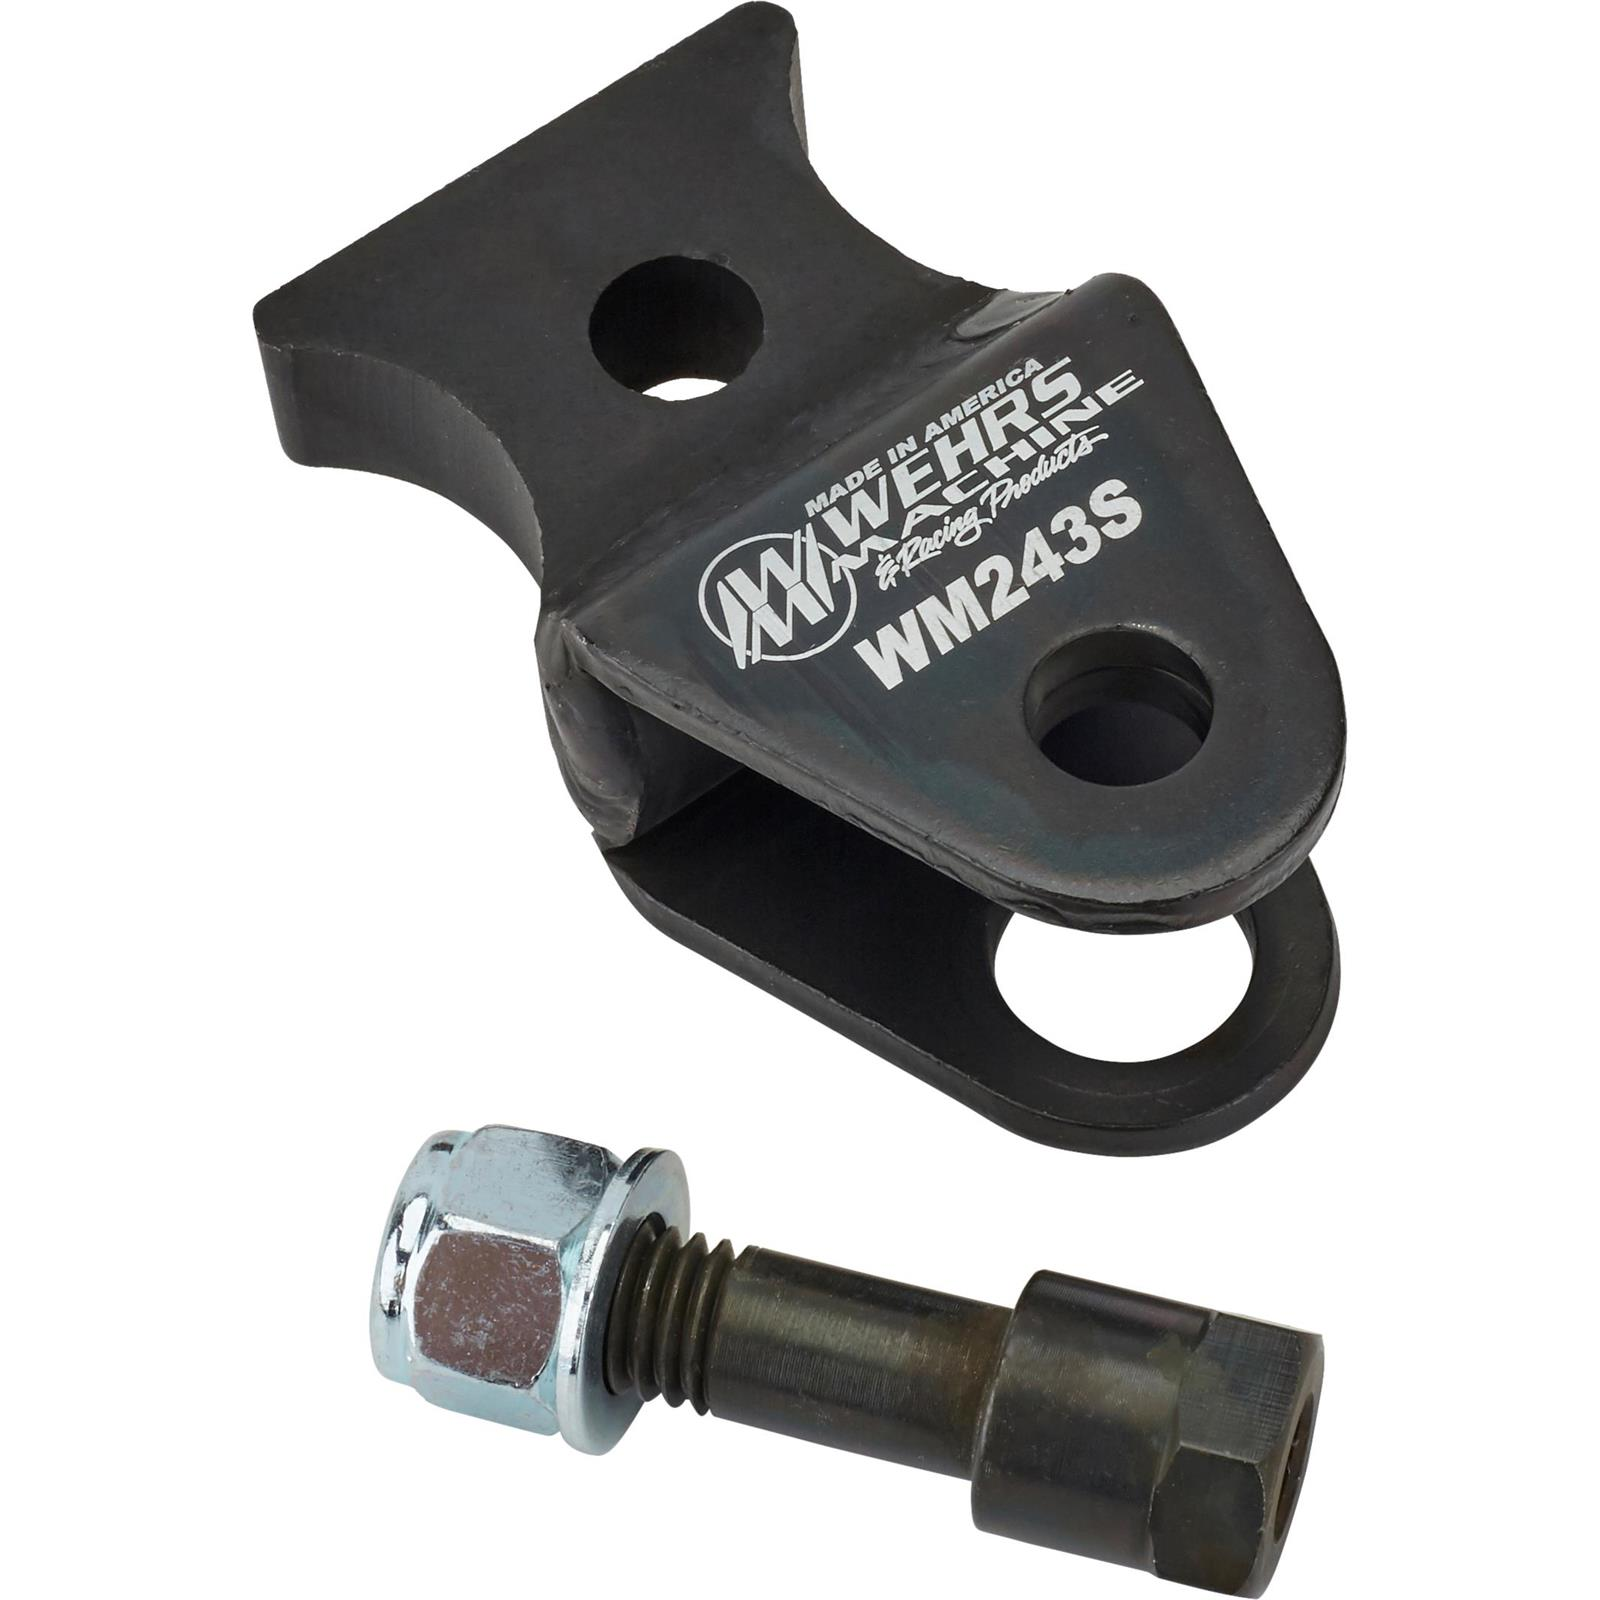 QA1 BAR350K T-Bar Shock Mounting Kit